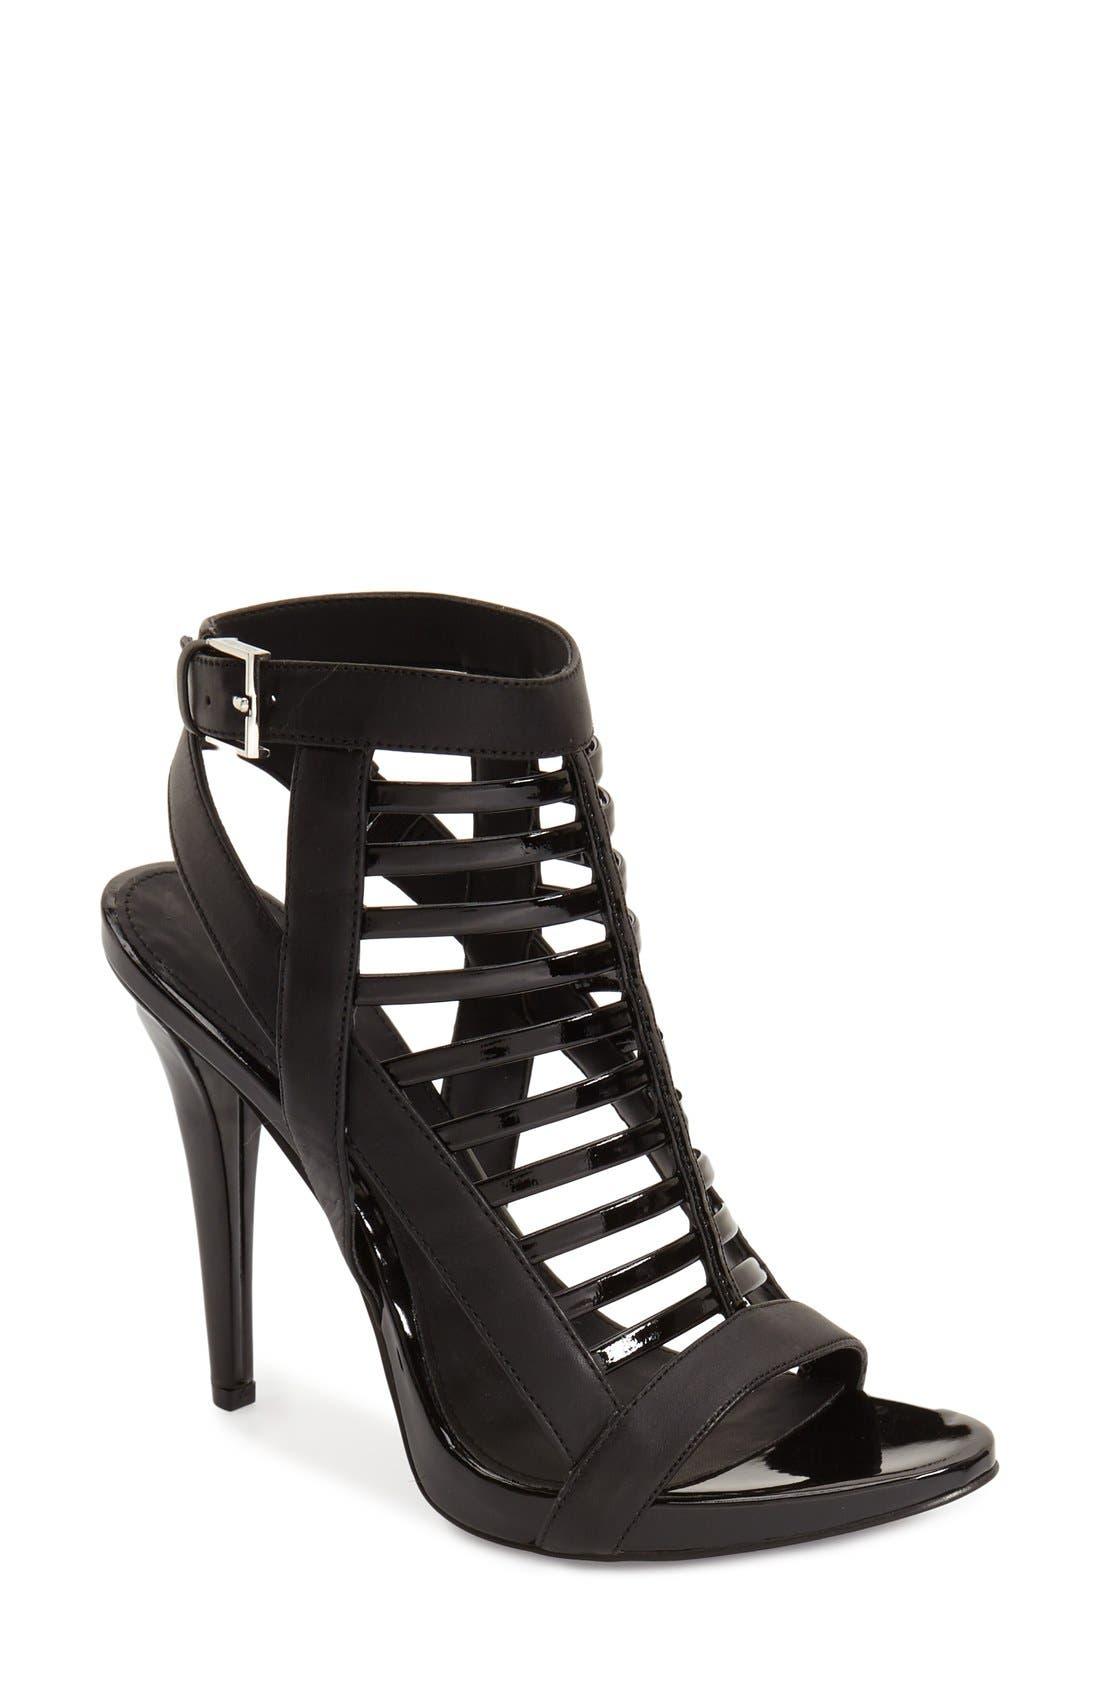 Alternate Image 1 Selected - Calvin Klein 'Nalo' Caged Sandal (Women)